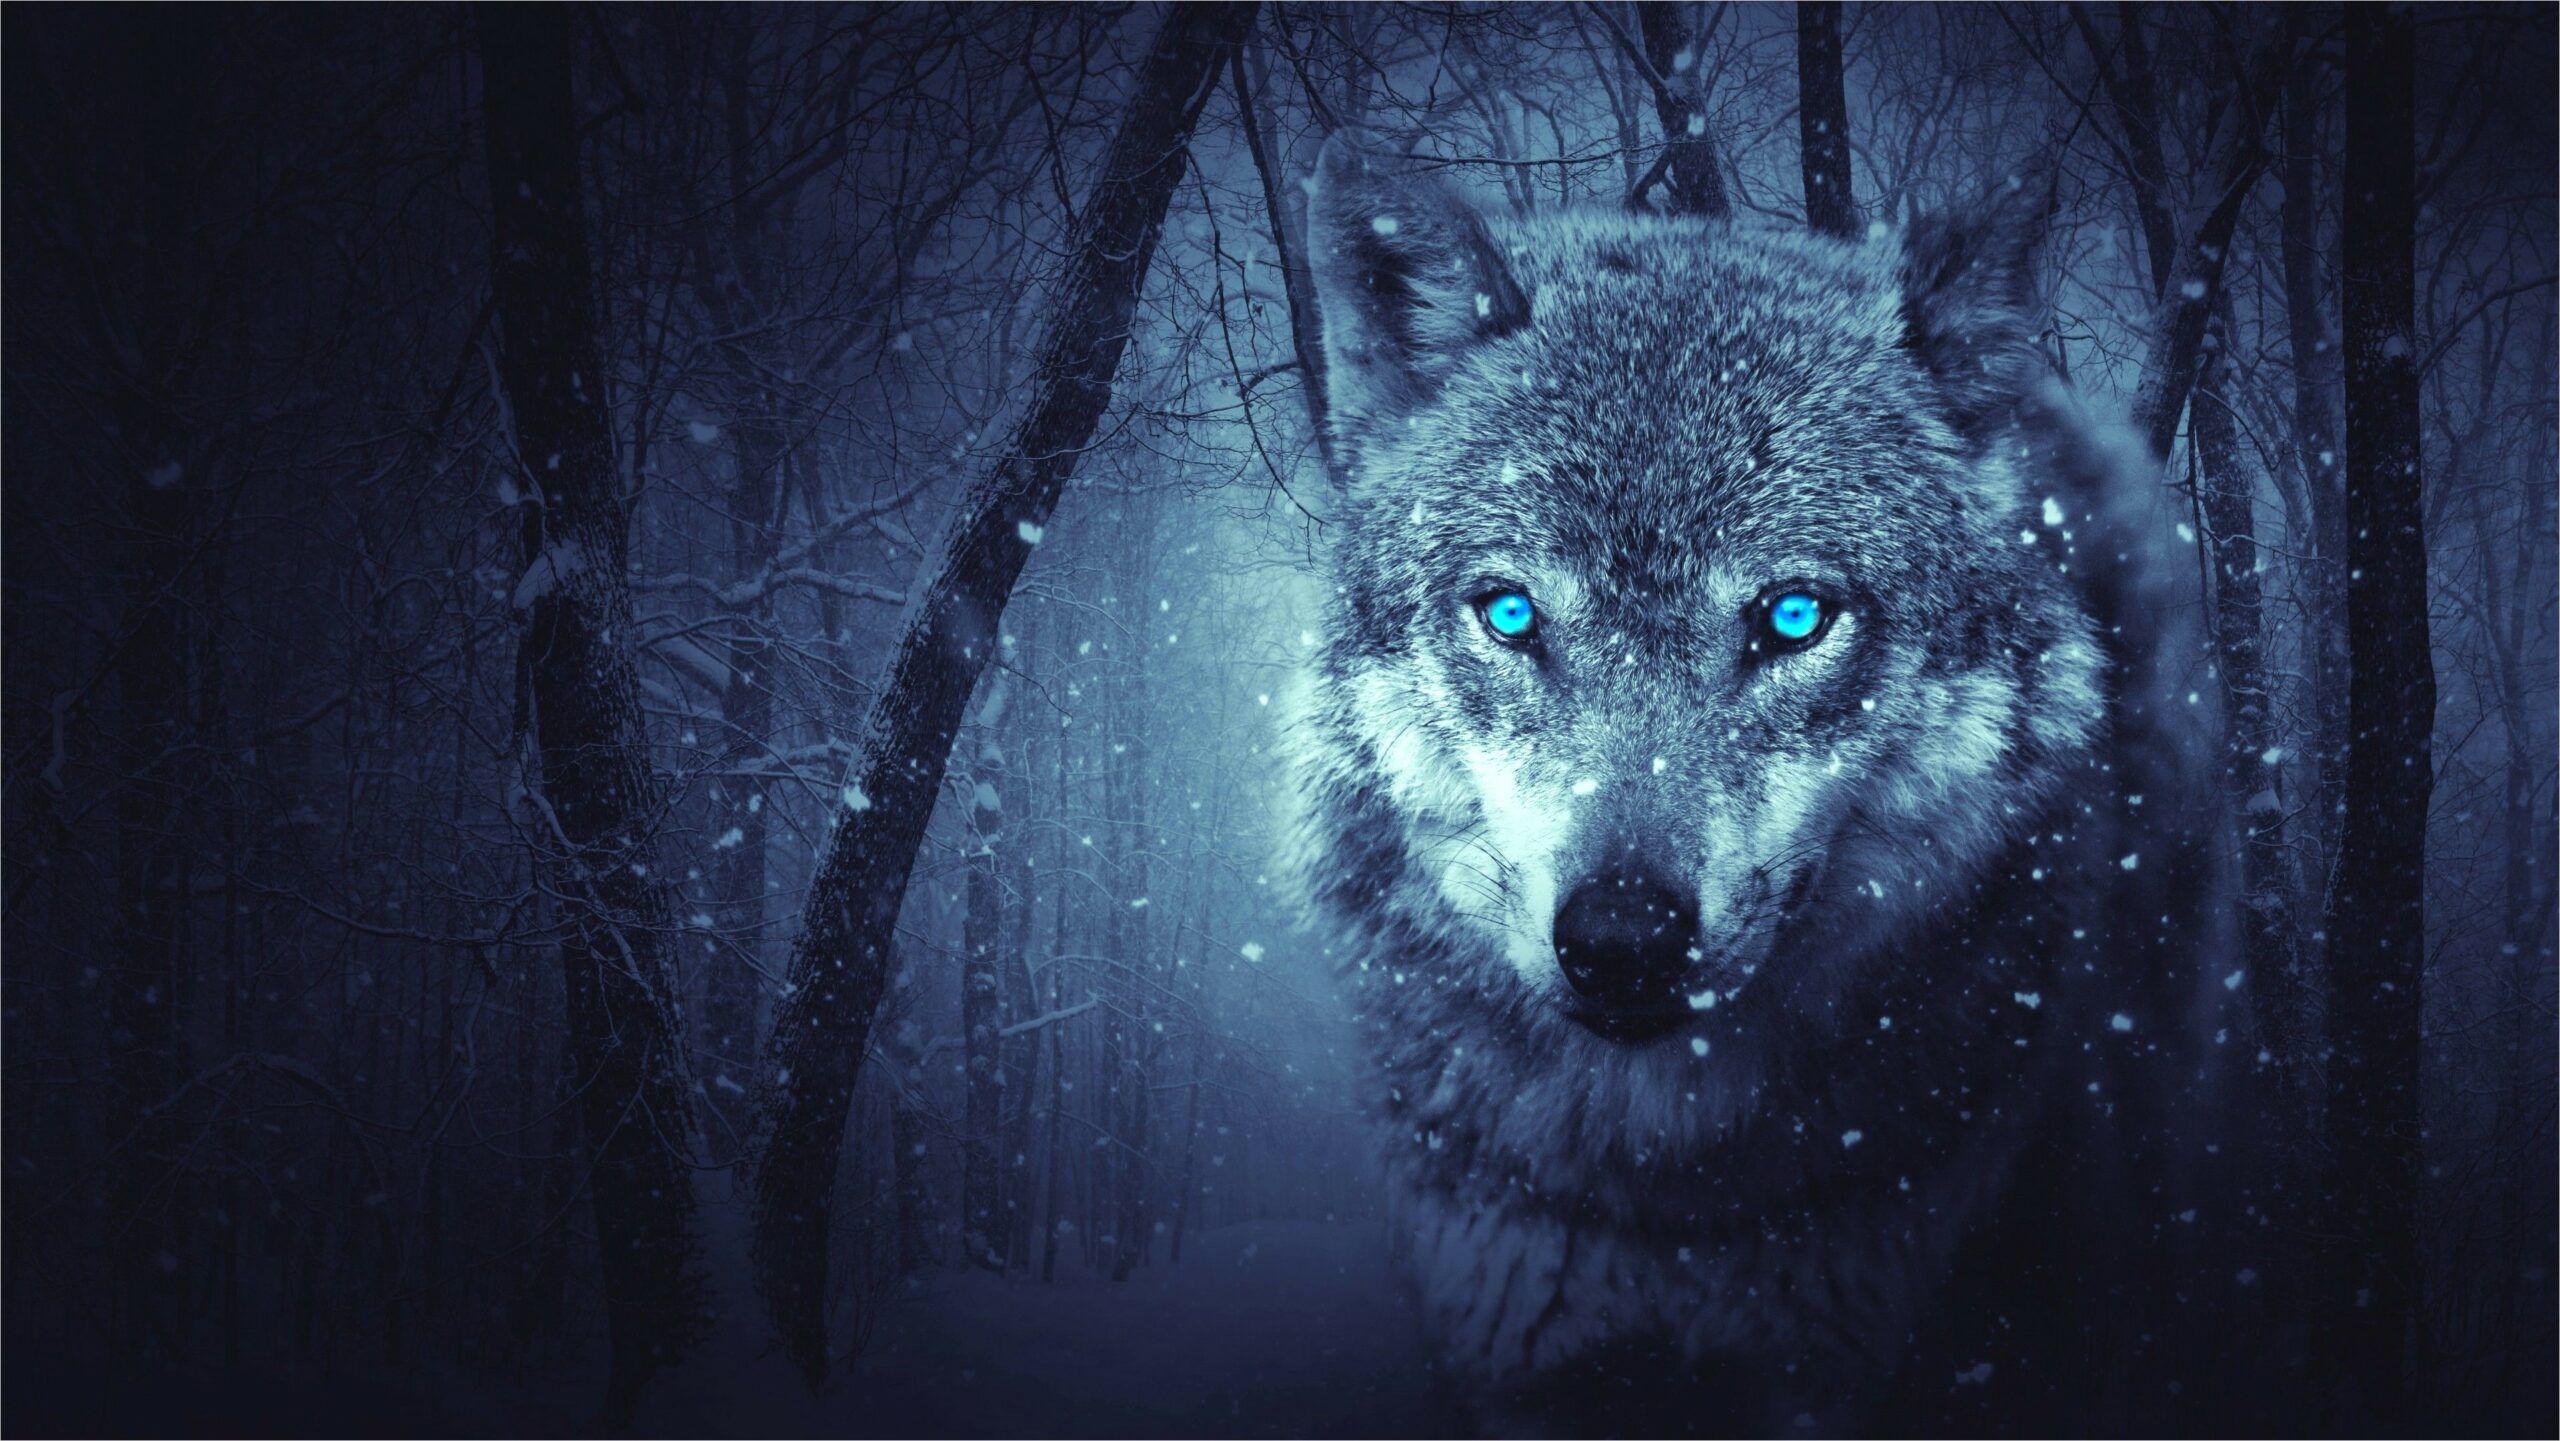 2560 X 1440 Blue Wolf Wallpaper 4k In 2020 Wolf Wallpaper Fantasy Wolf Animal Categories